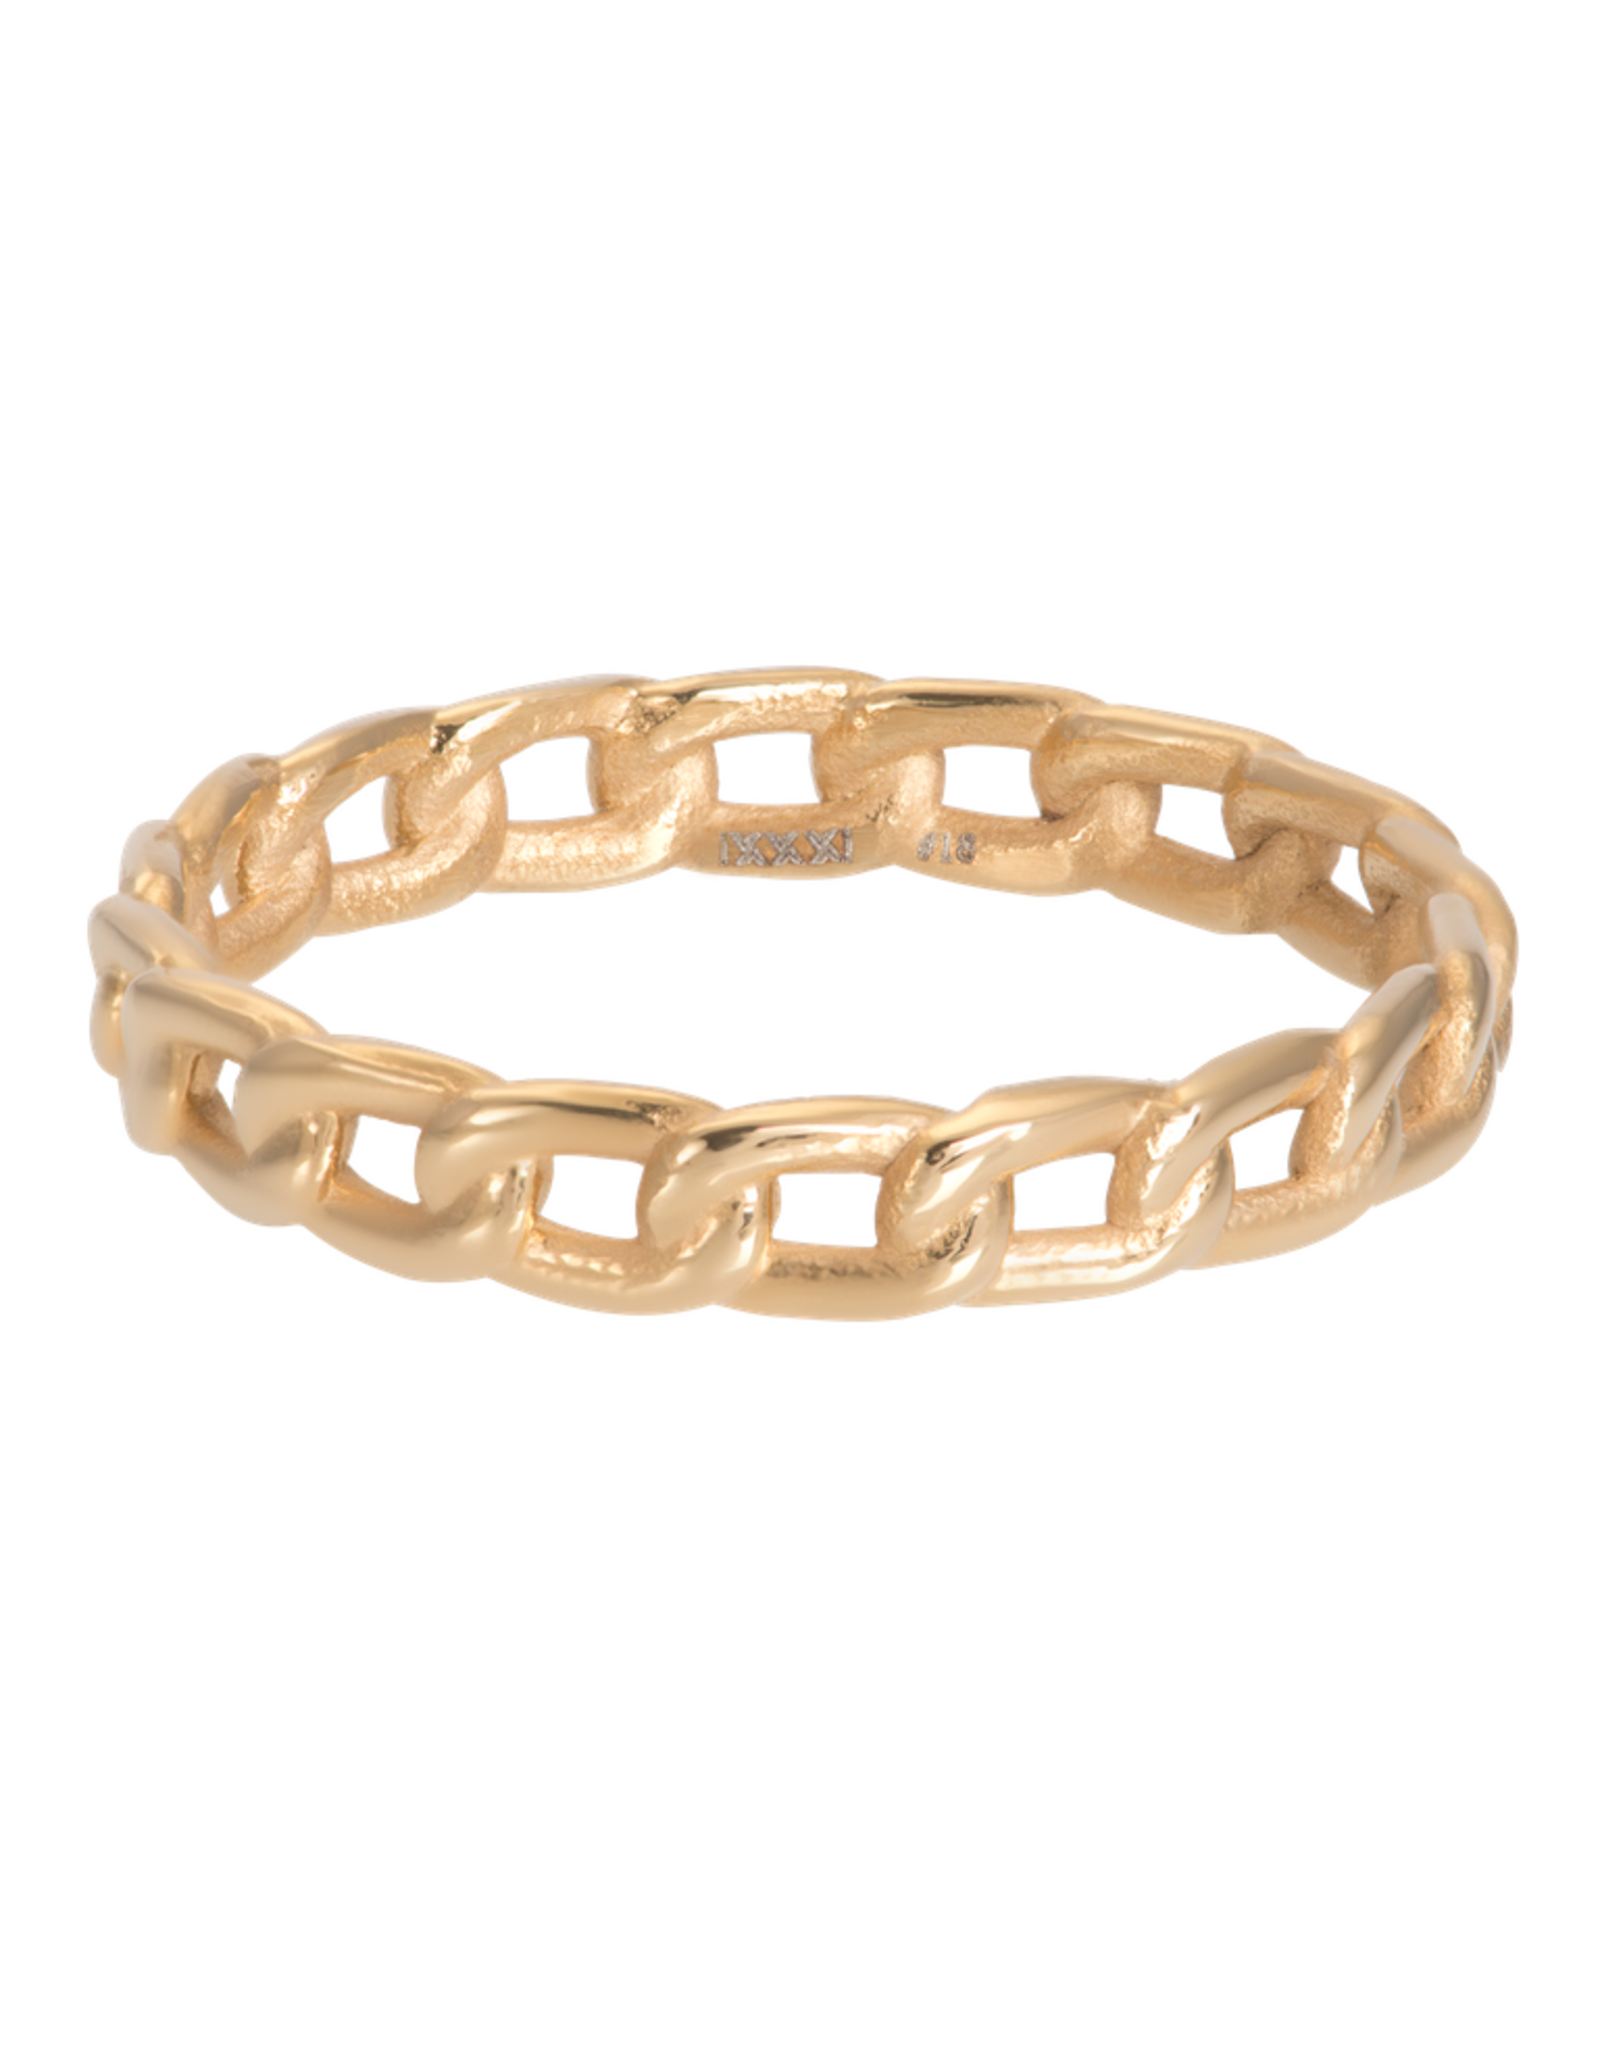 iXXXi Jewelry iXXXi vulring Enjoy - goud